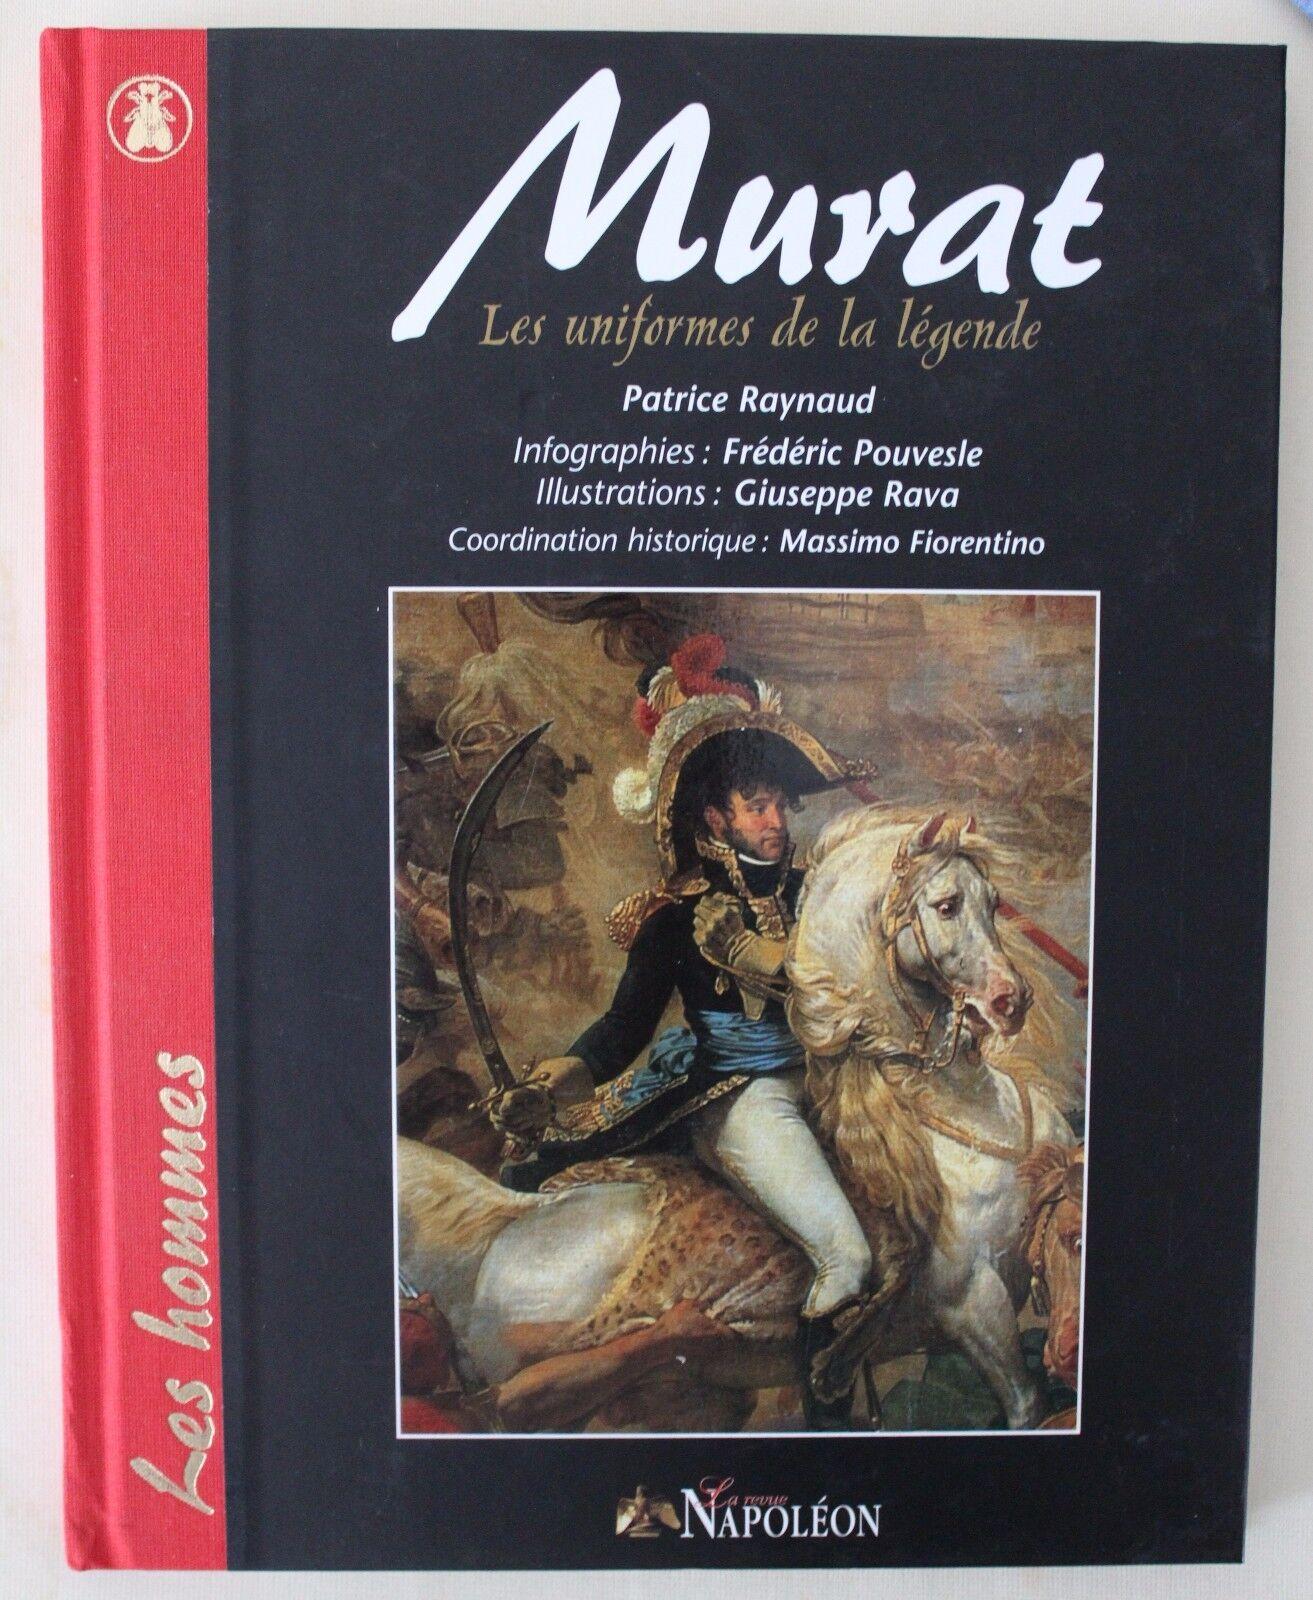 █▓▒░ Must Have book OOP, HTF   Murat, les Uniformes de la légende   L@@k   ░▒▓█